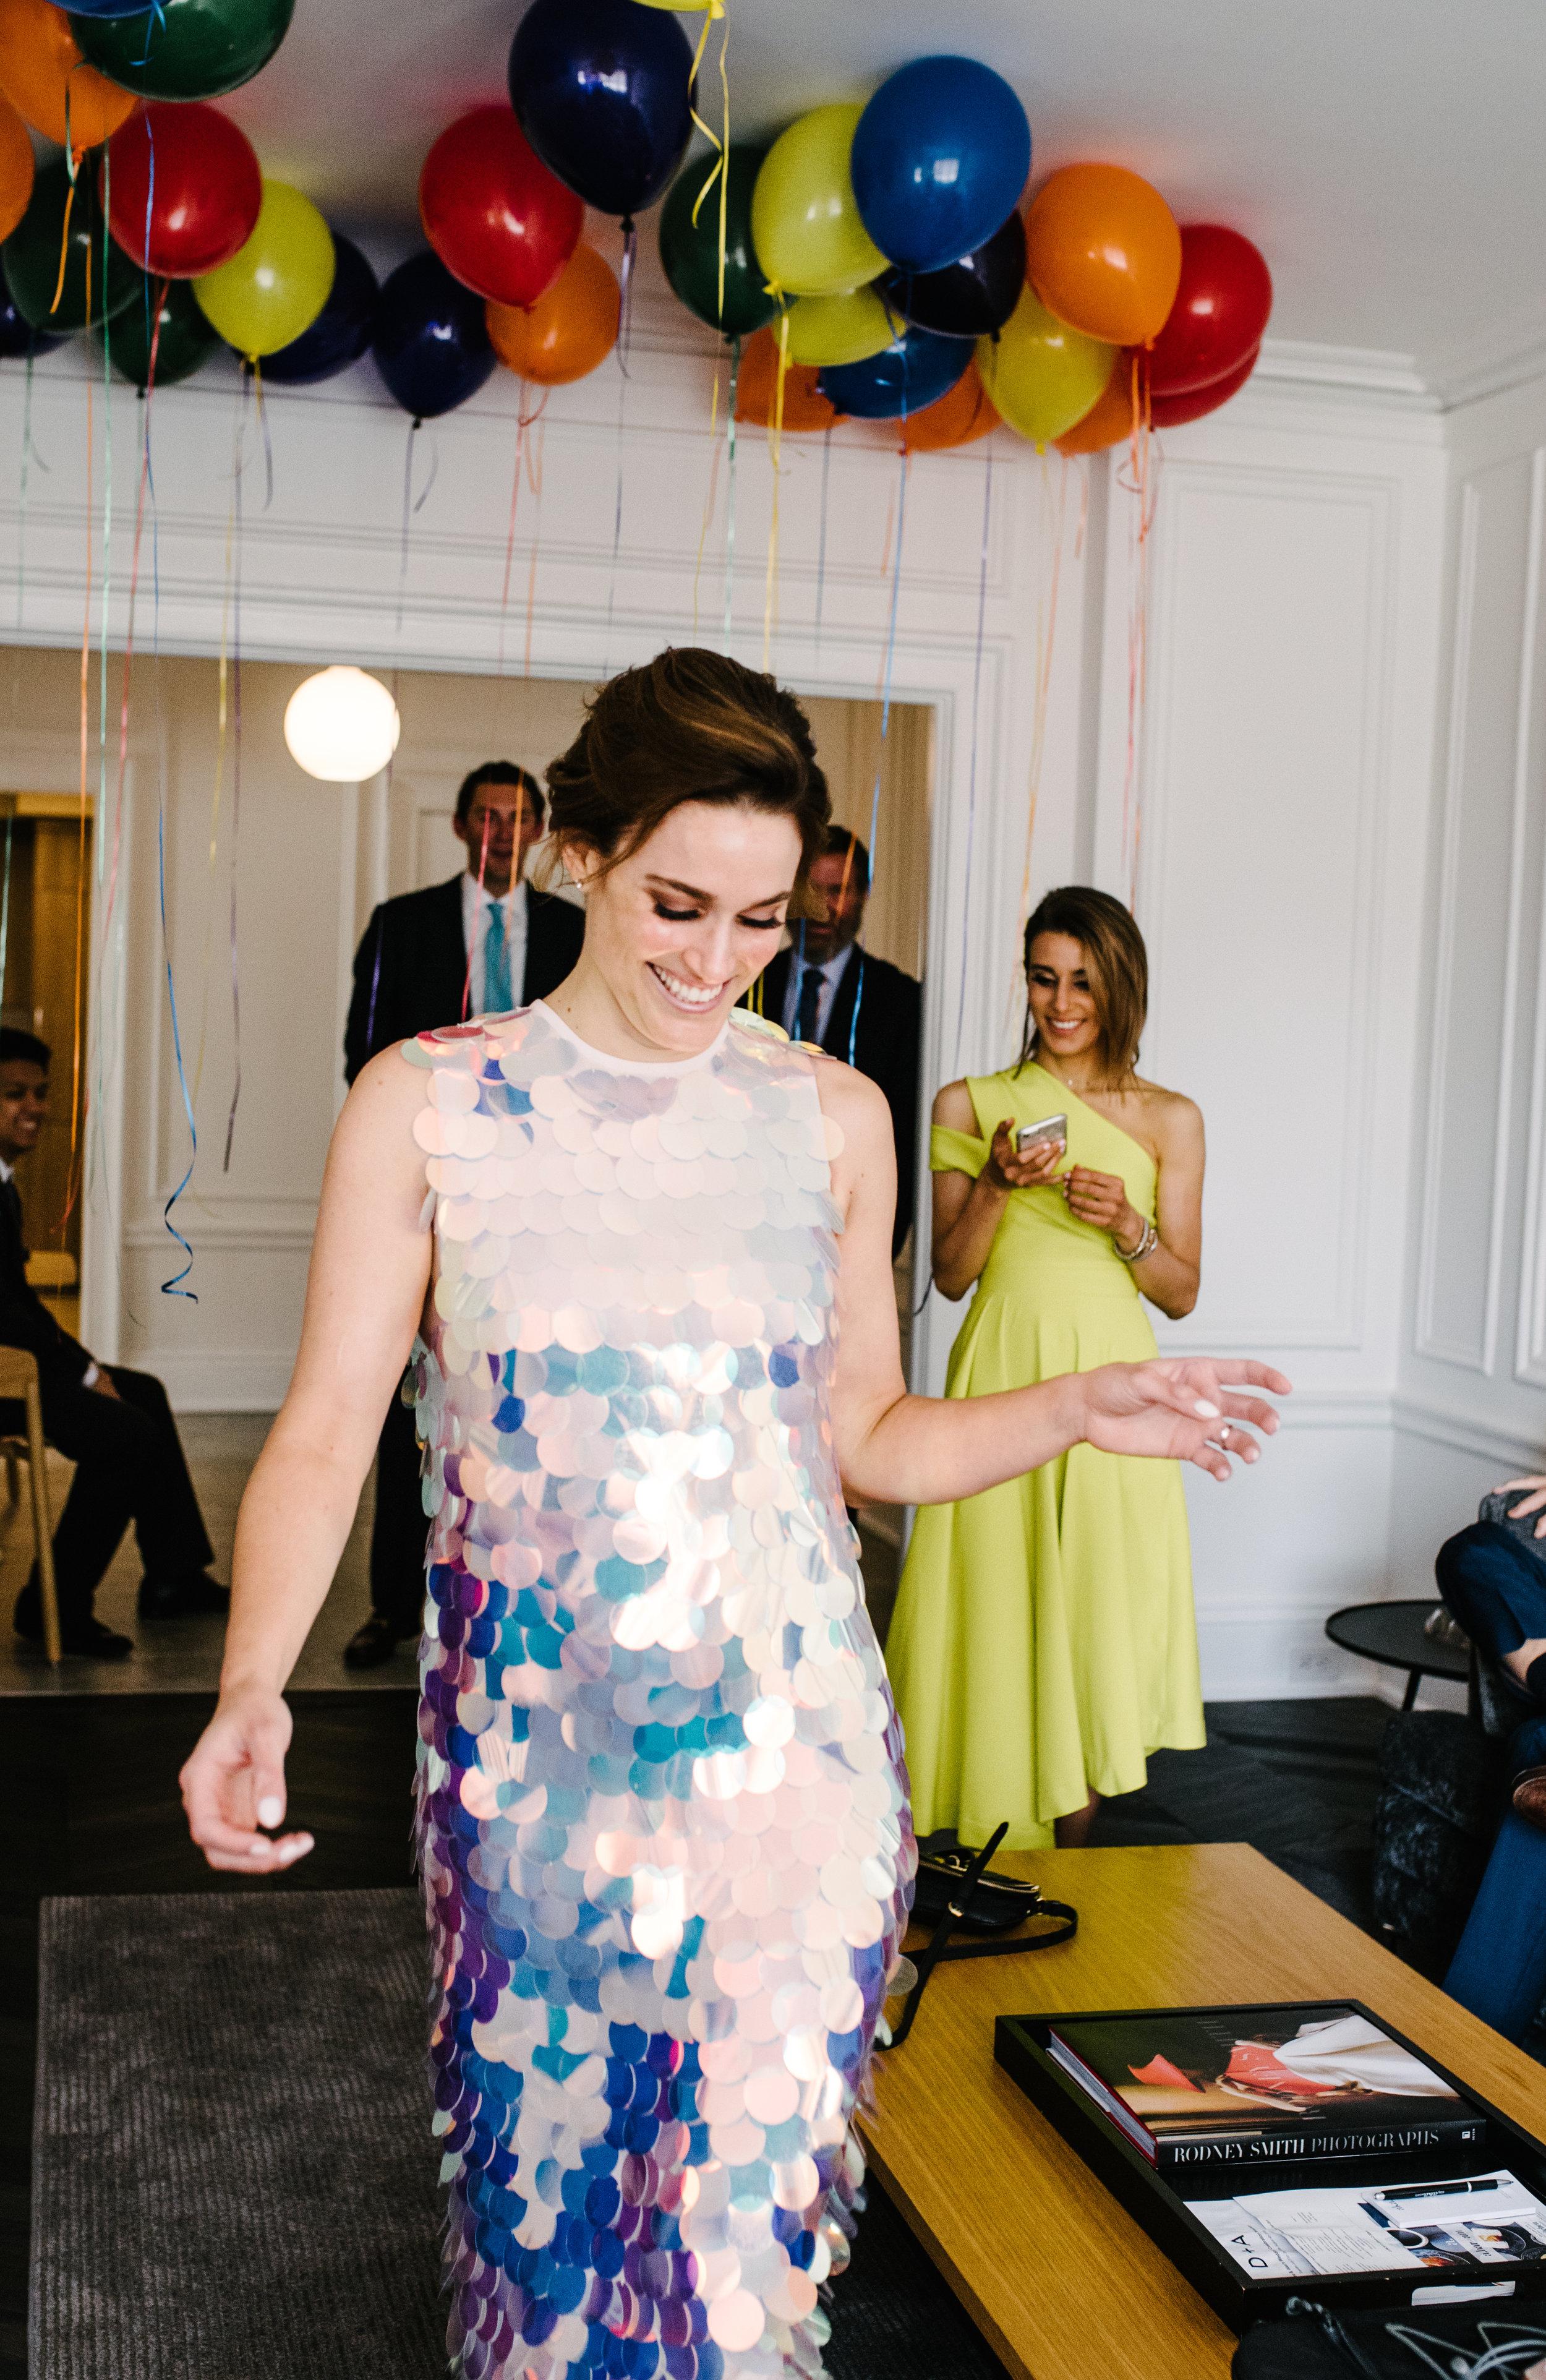 agpcollective_wedding_vernick-4535.jpg